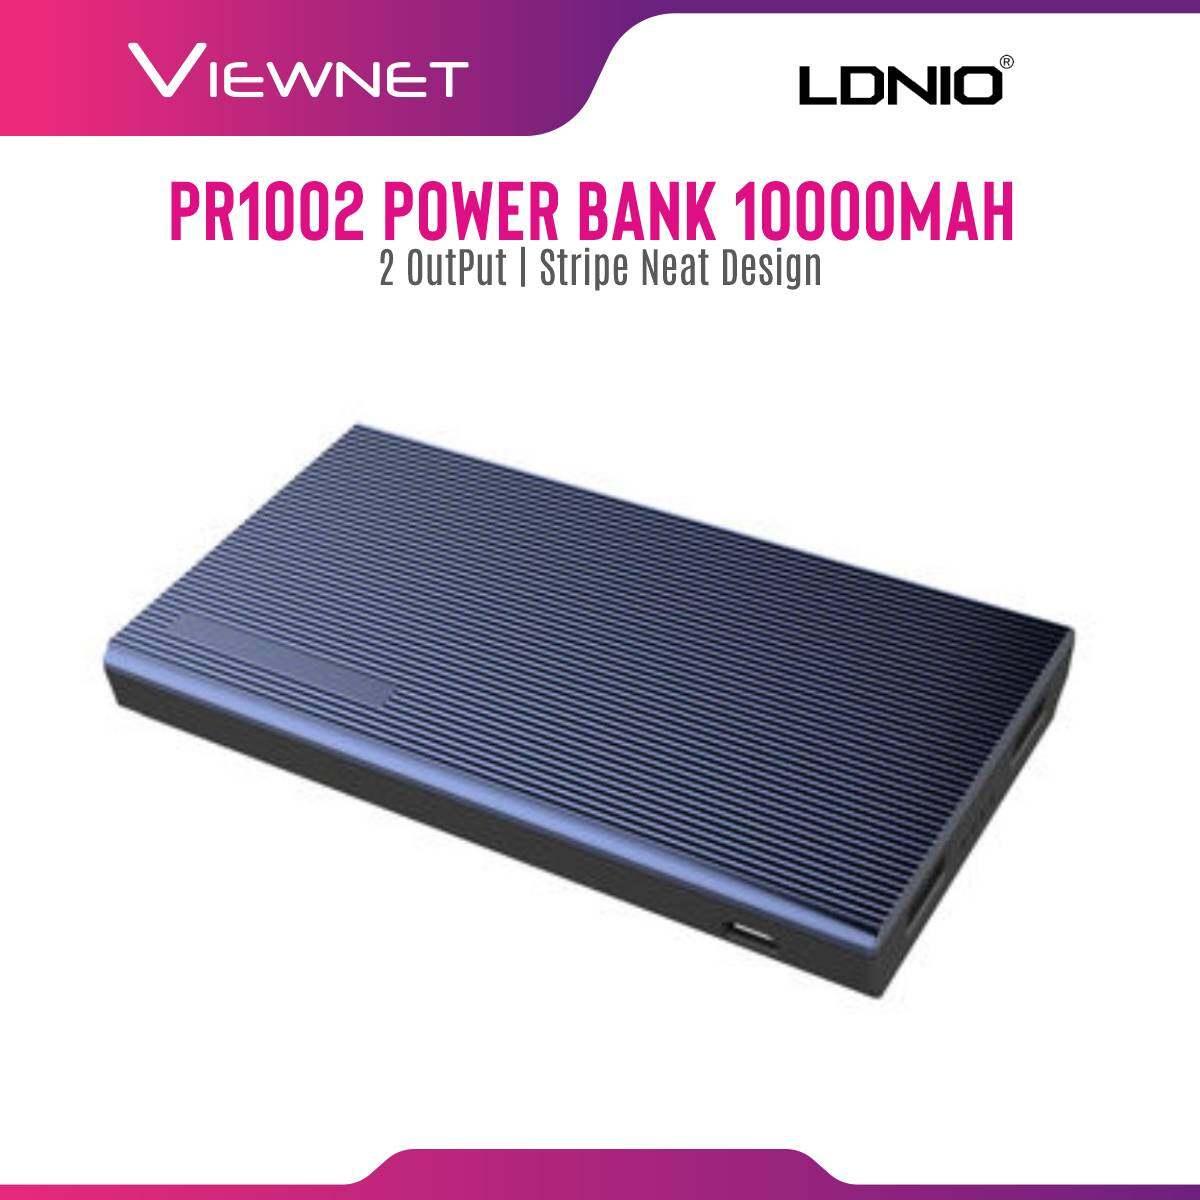 Ldnio 10000MAH Power Bank 2-OUT 2.1A (PR1002) DC5V / 2.1A, Input Micro USB, Output 2 USB-A Ports, Blue